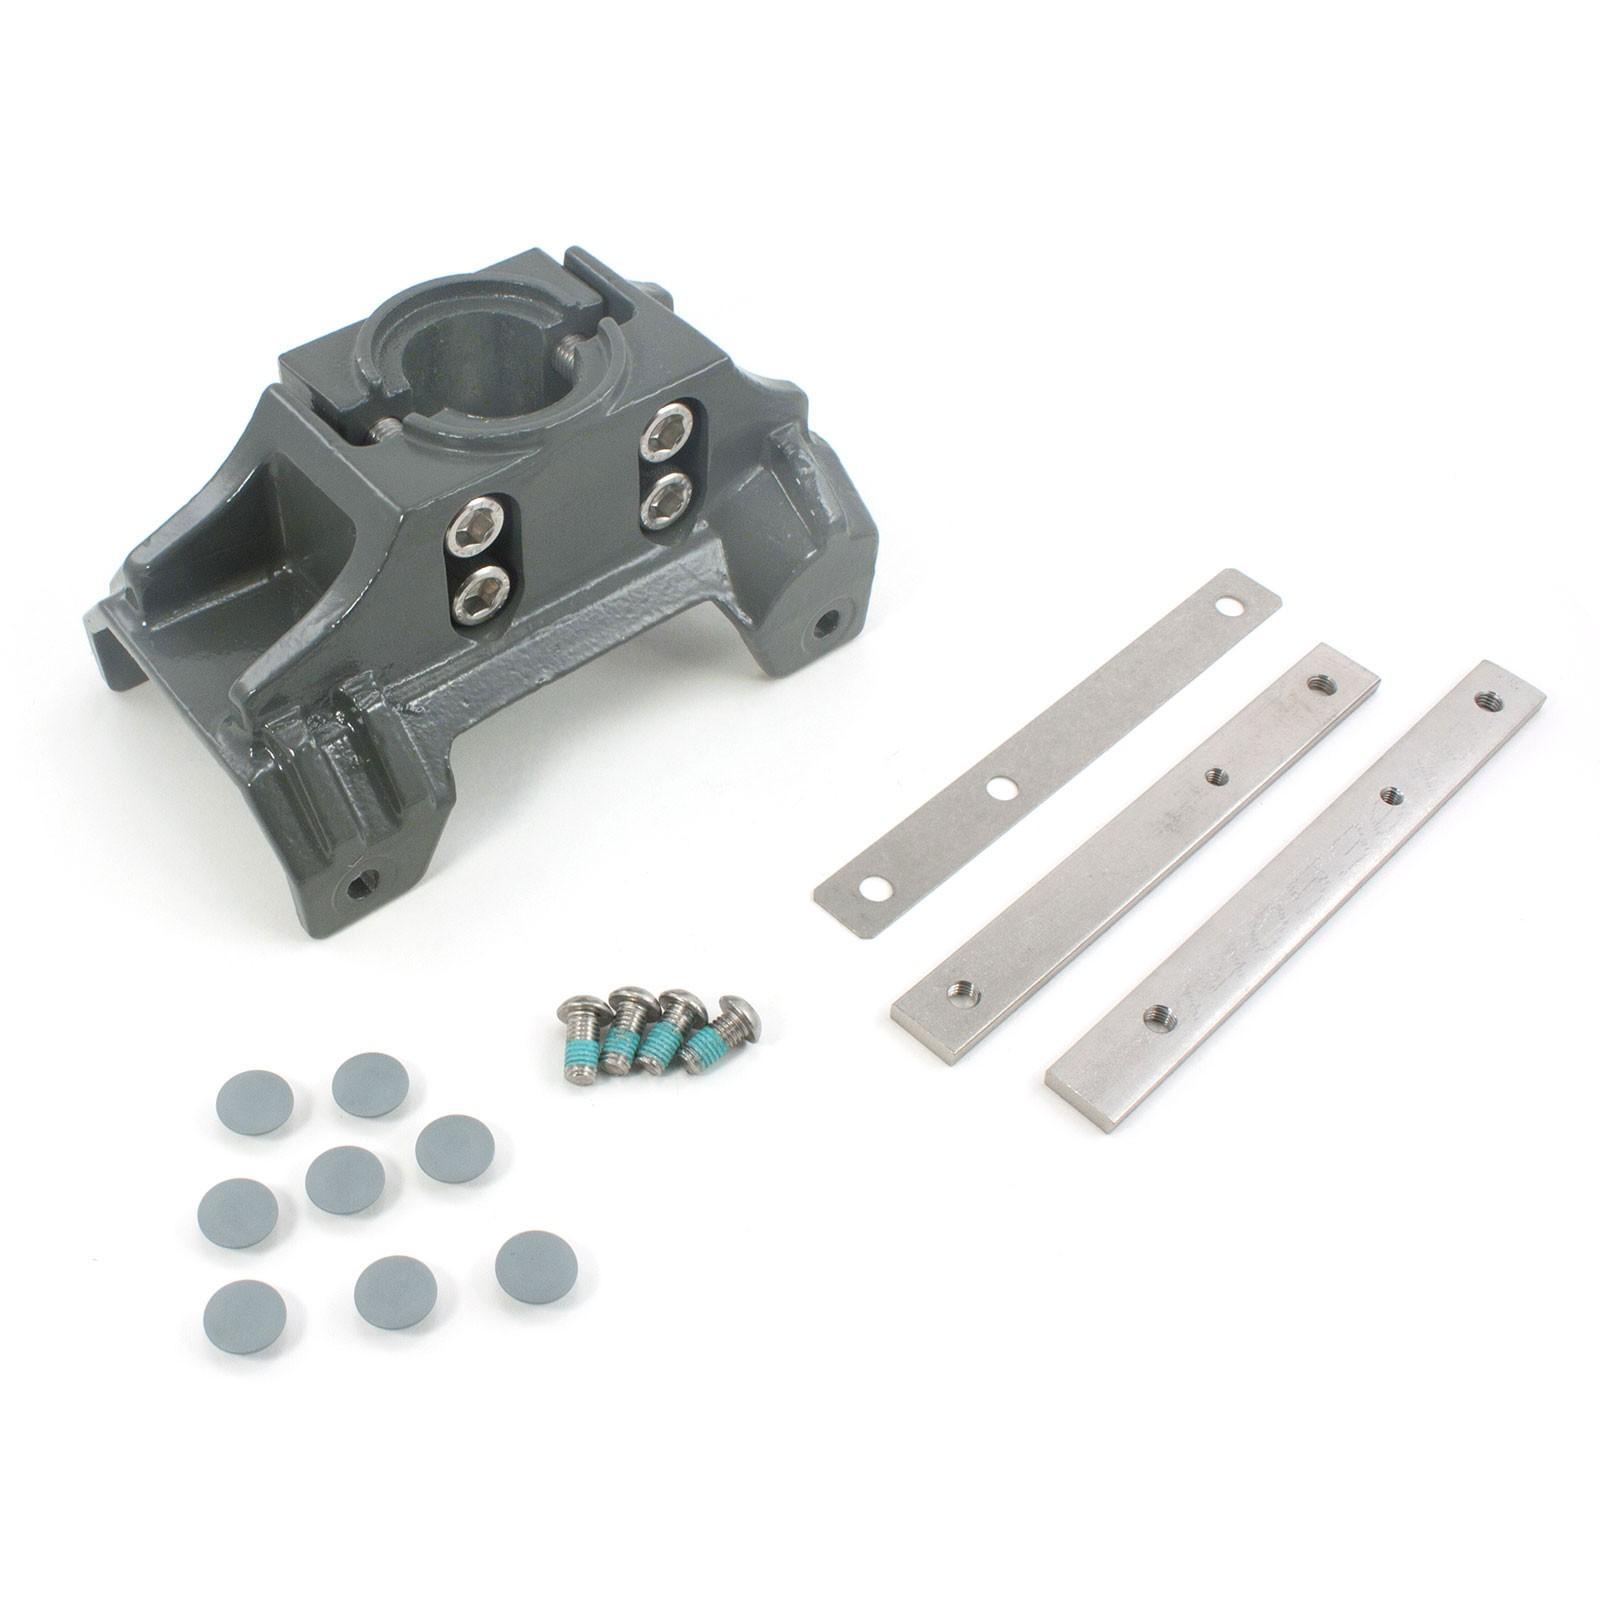 Magnetic Boom Arm : Magnetic autocontrol standard microdrive flange